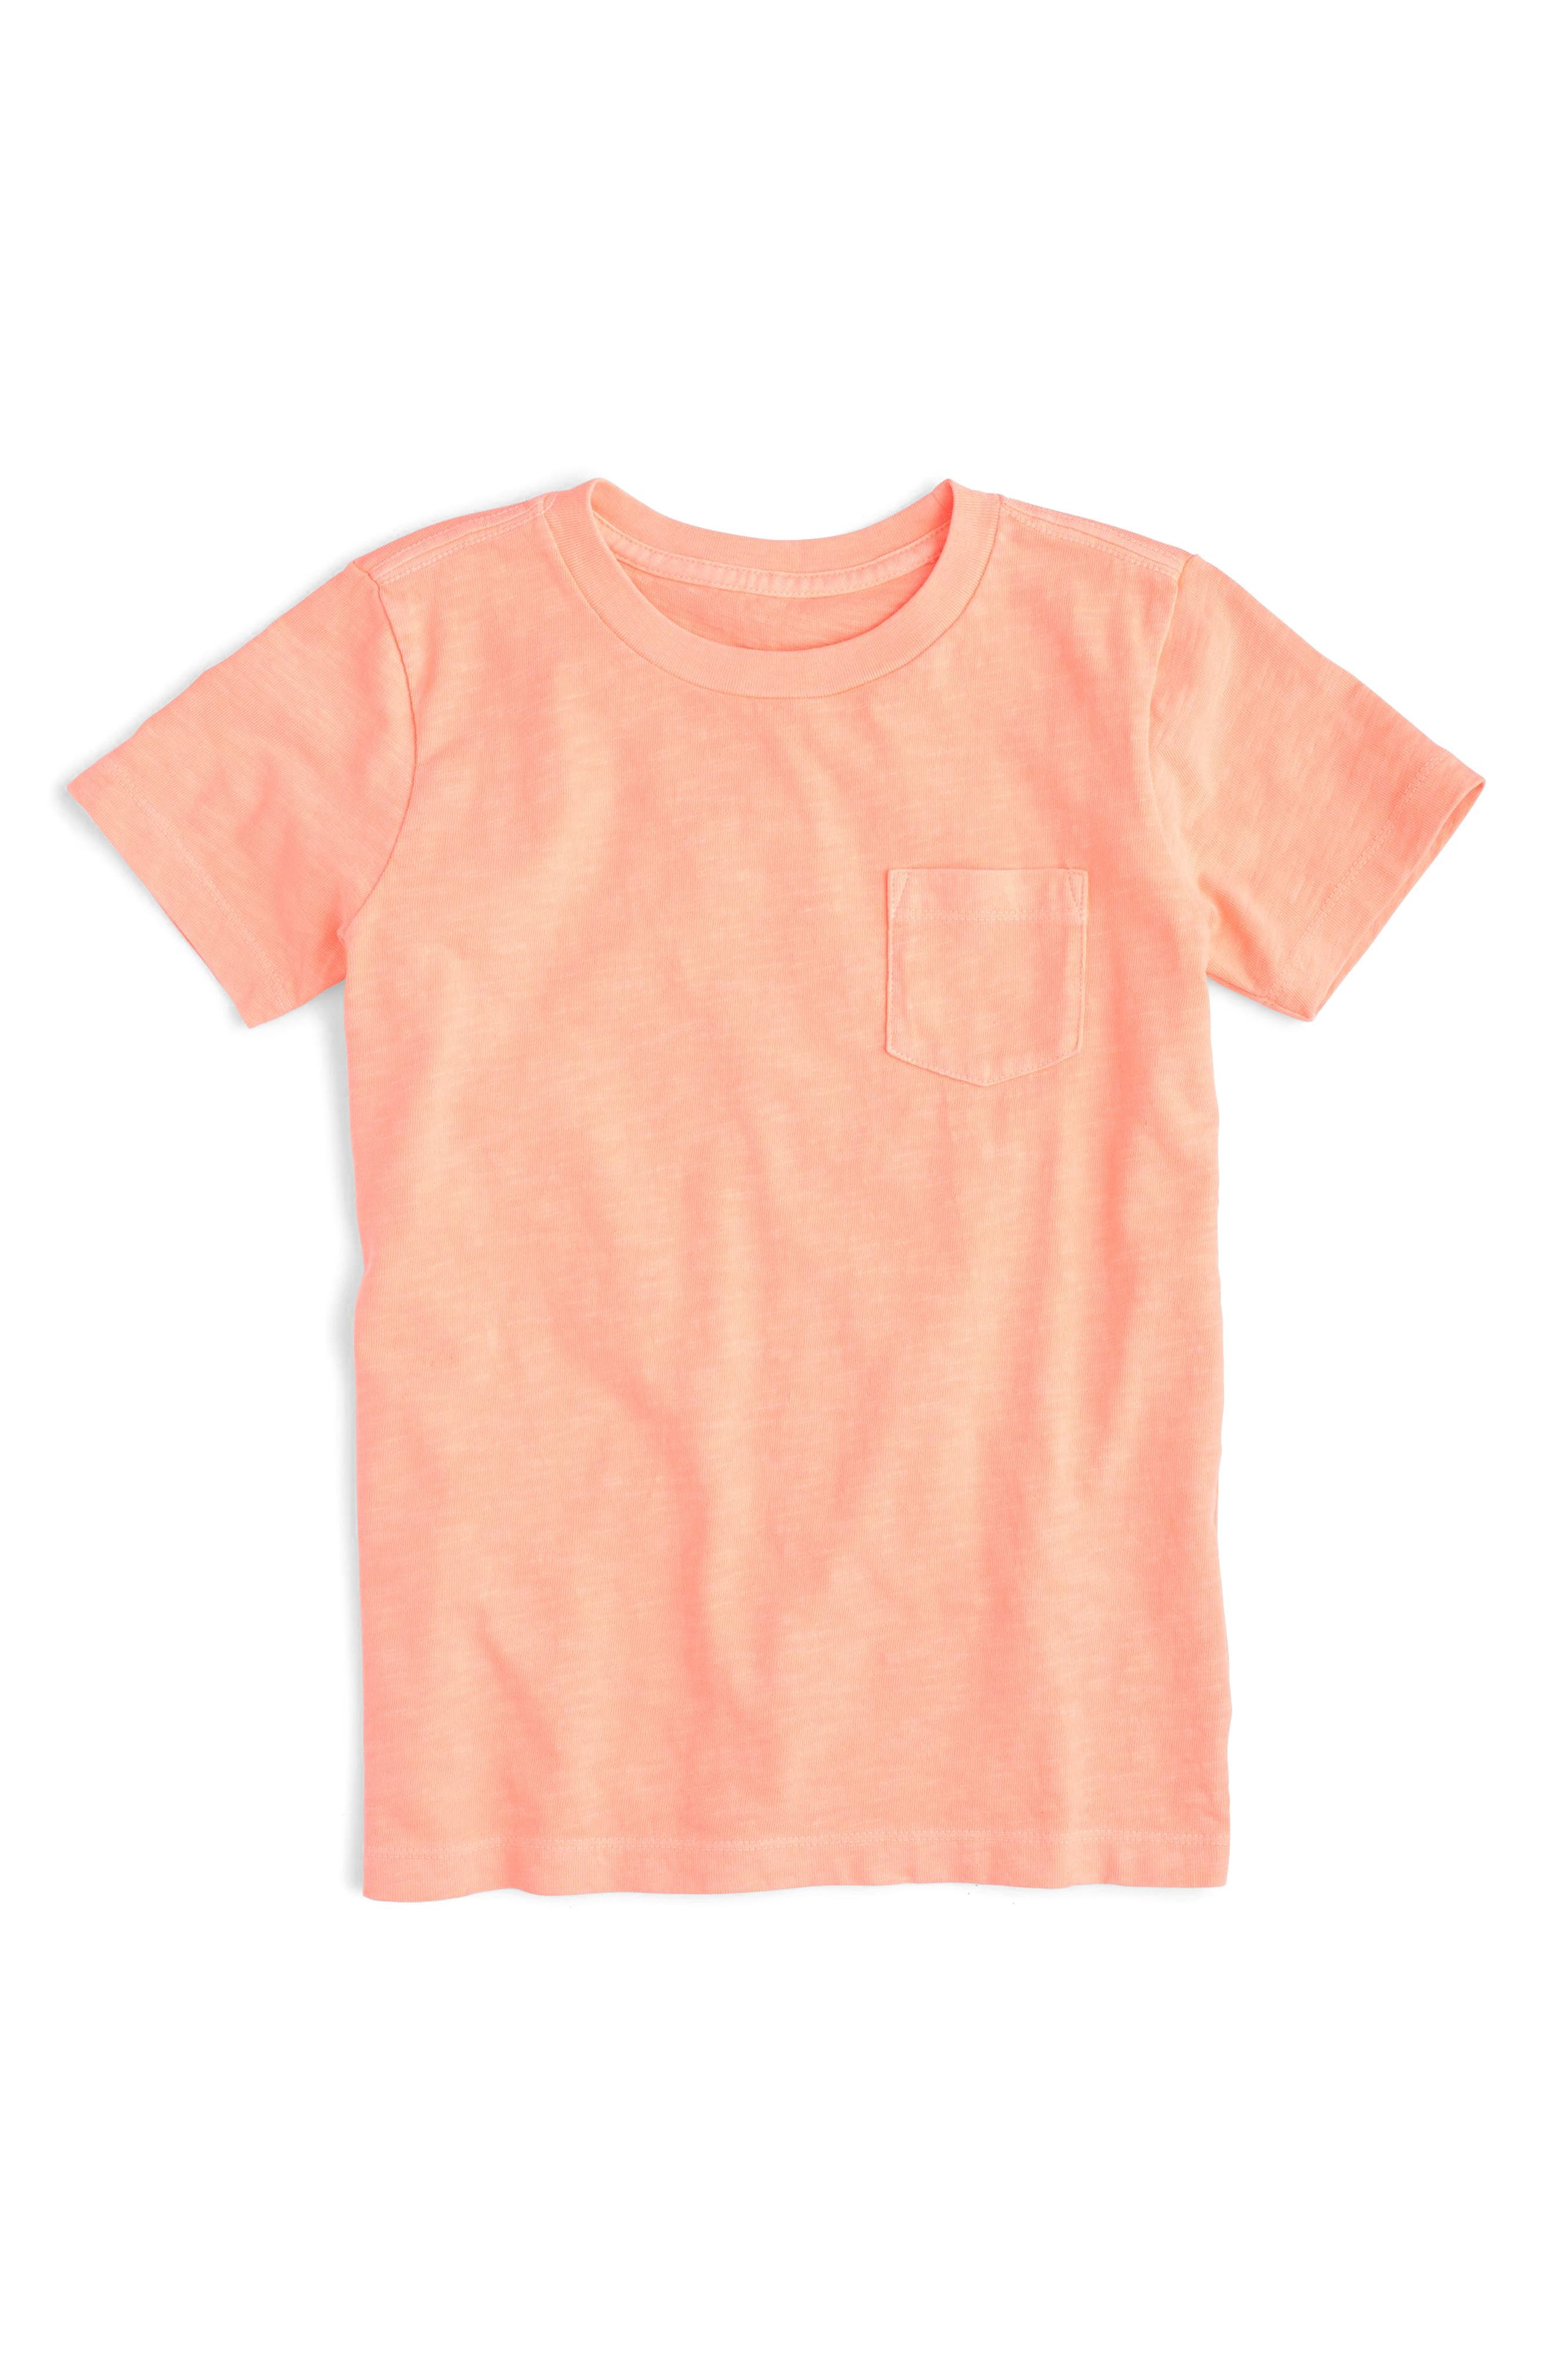 crewcuts by J.Crew Slubbed Pocket T-Shirt (Toddler Boys, Little Boys & Big Boys)